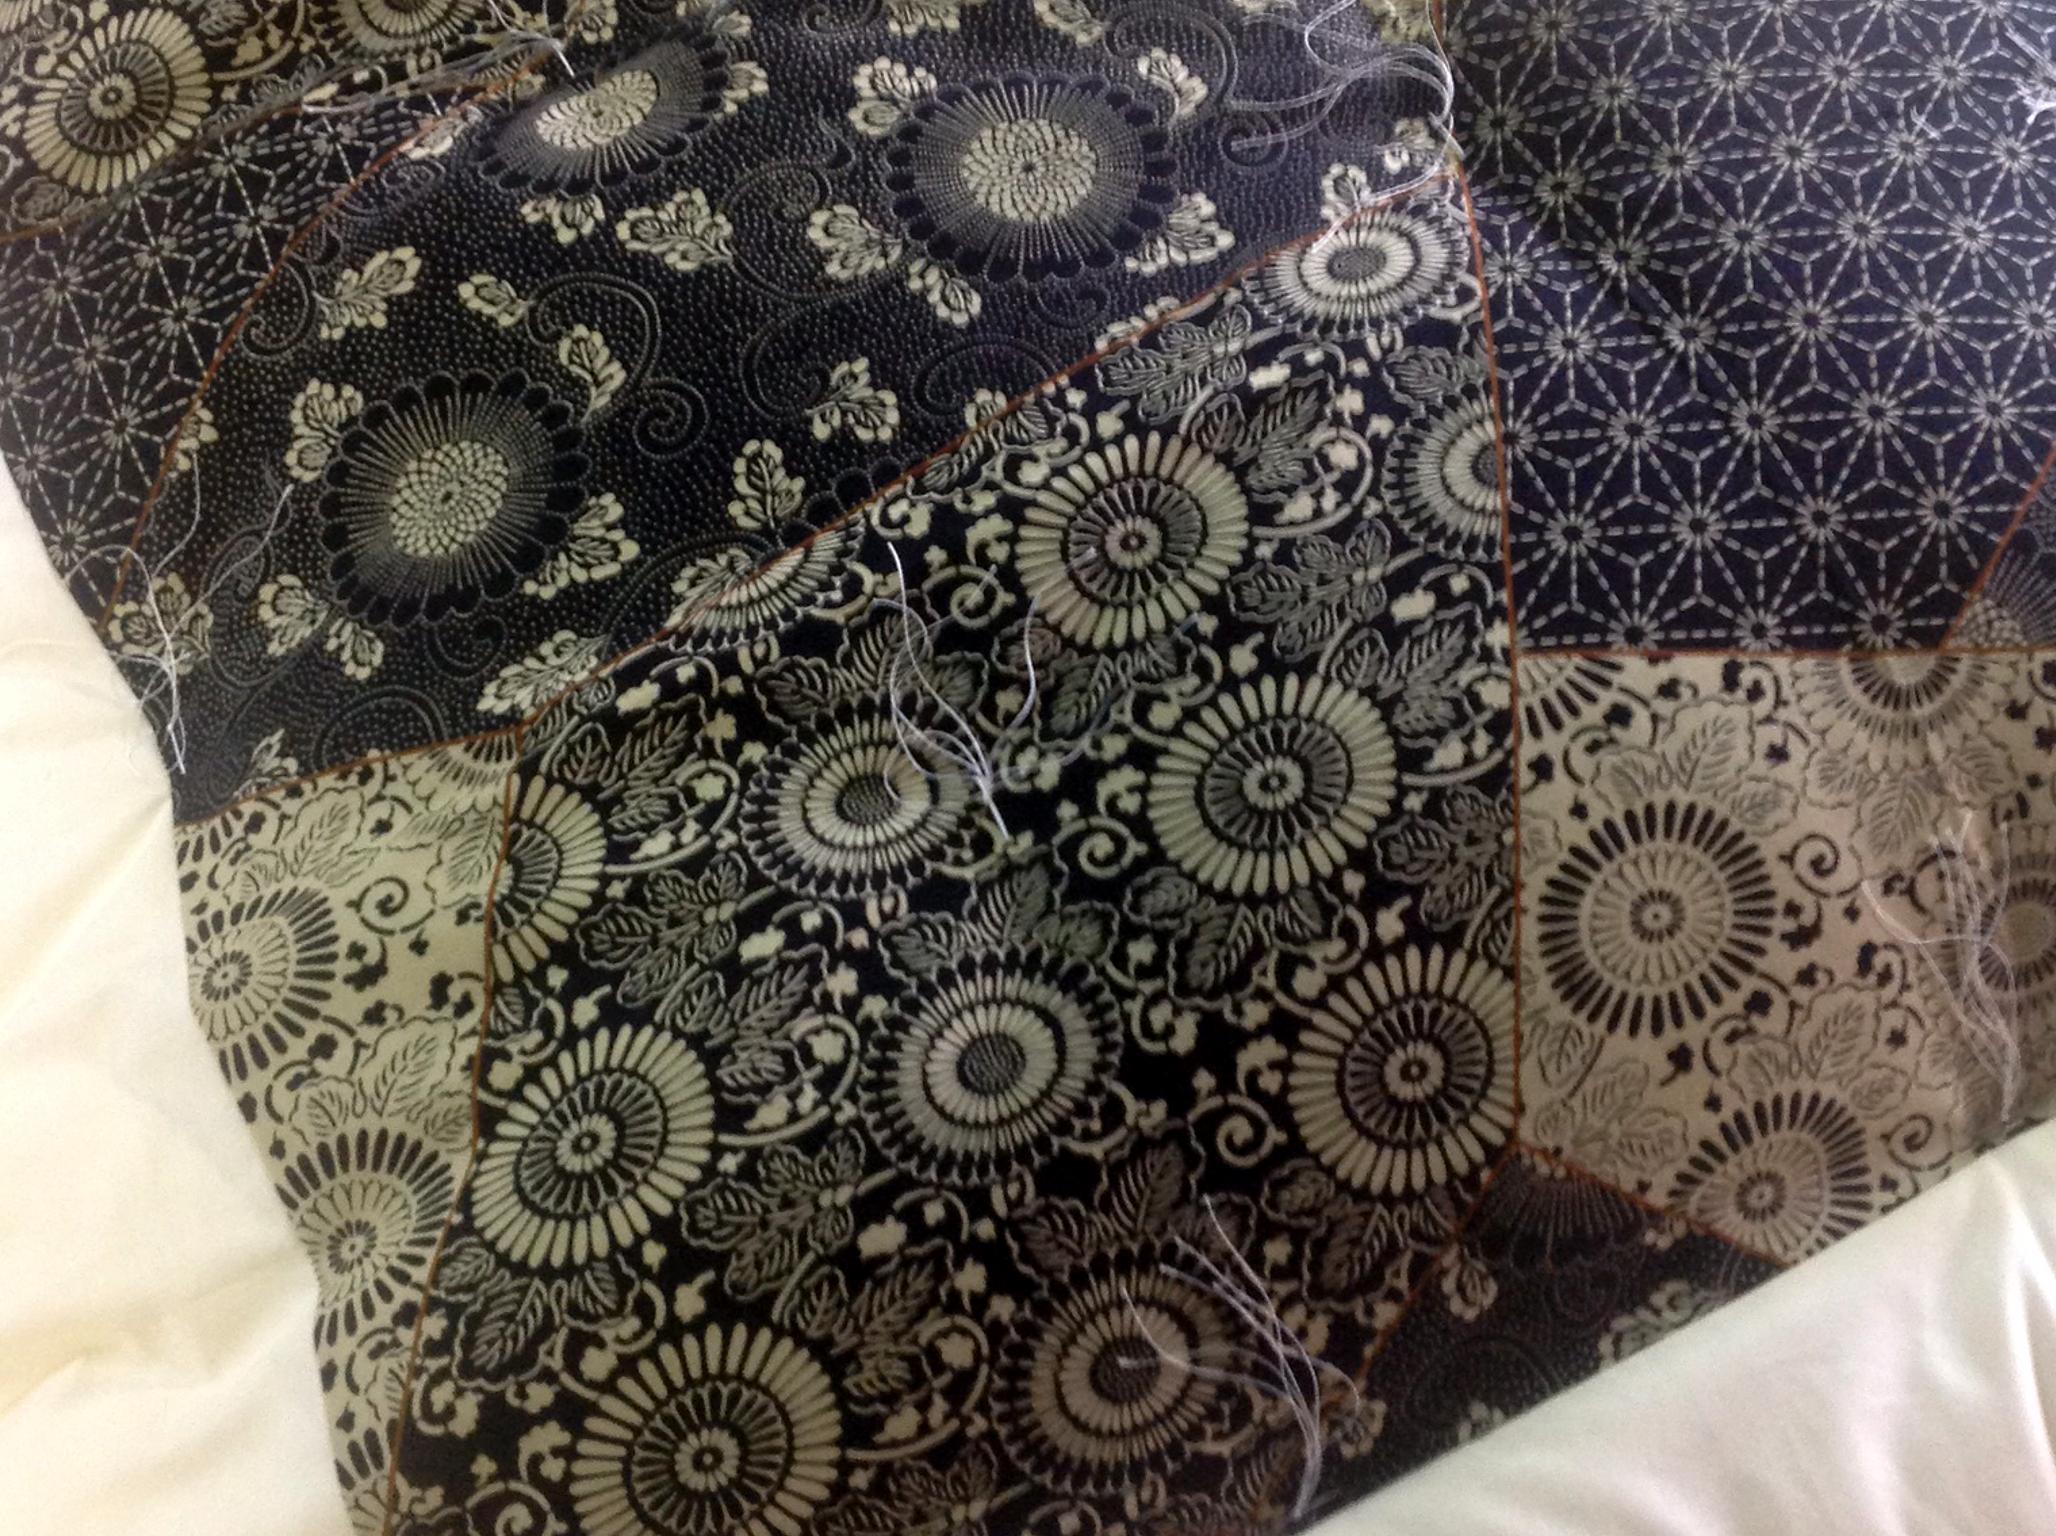 New futon fabrics navy-patchwork2